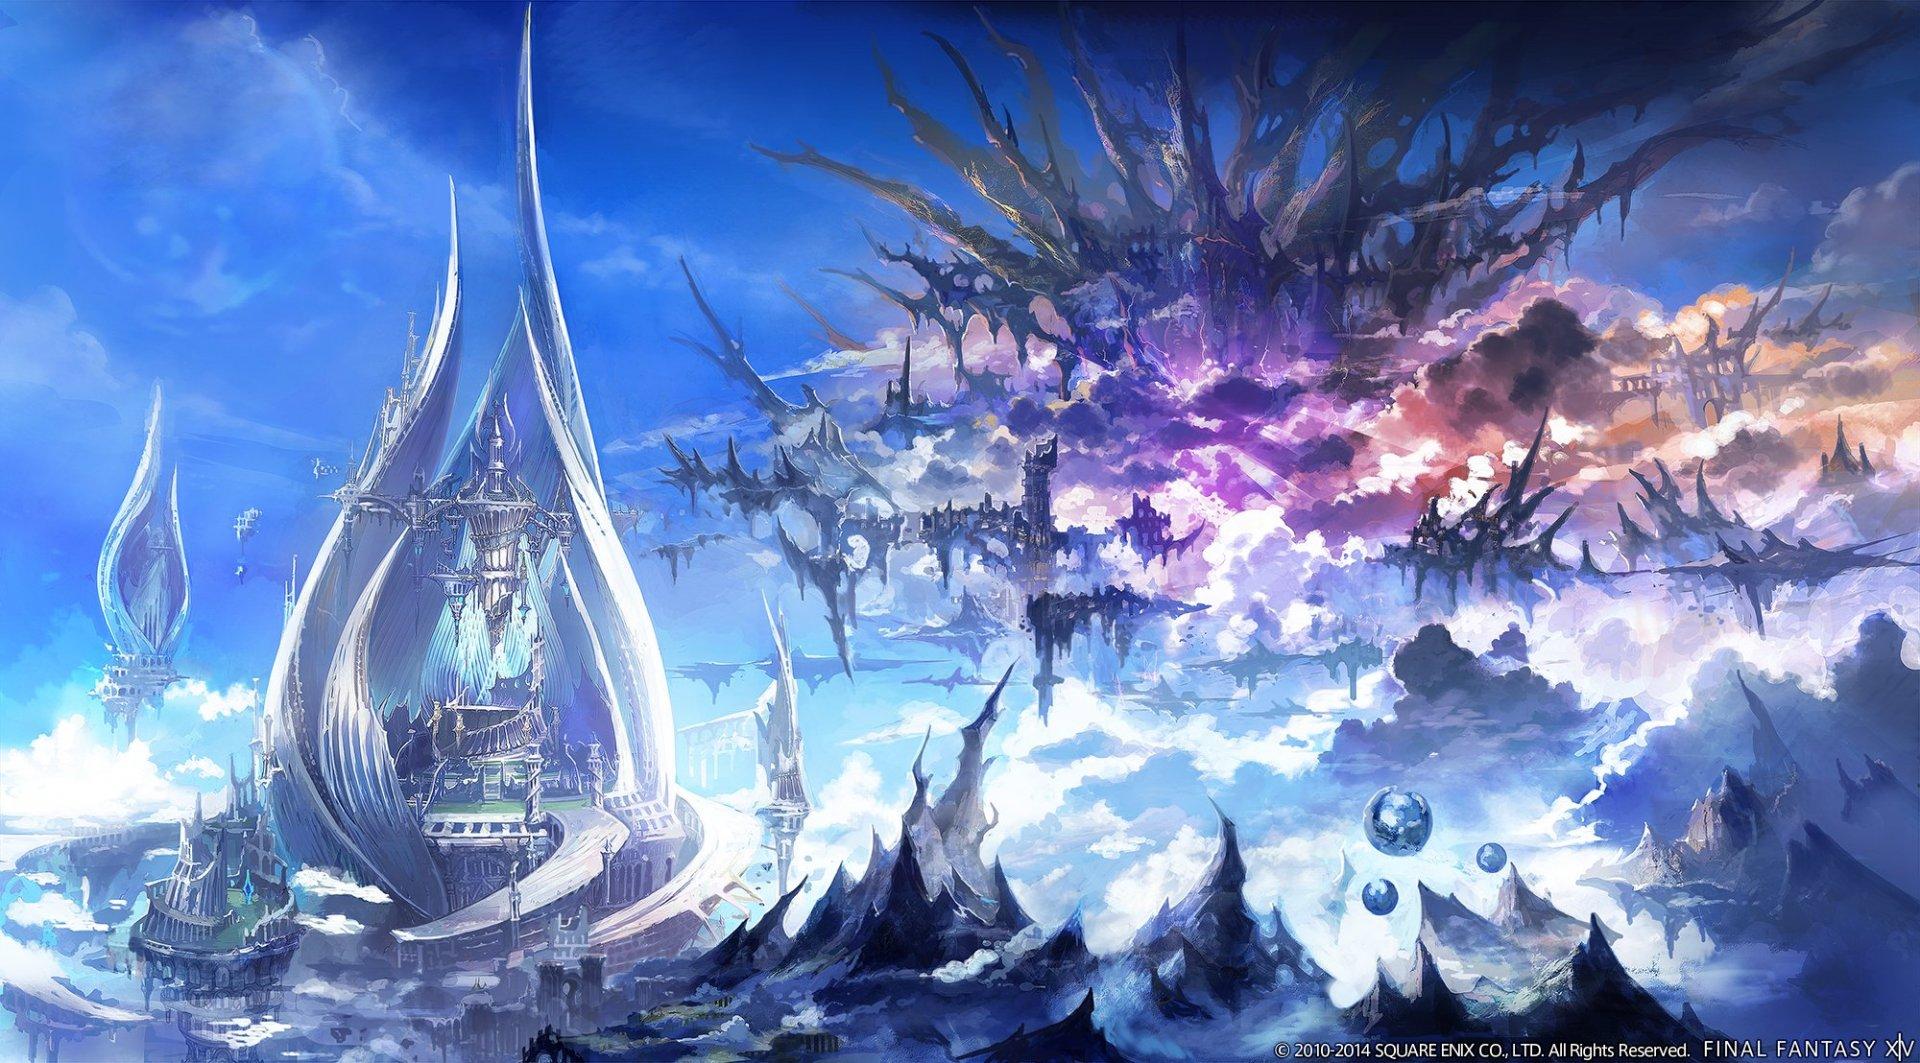 final fantasy xiv a realm reborn computer wallpapers